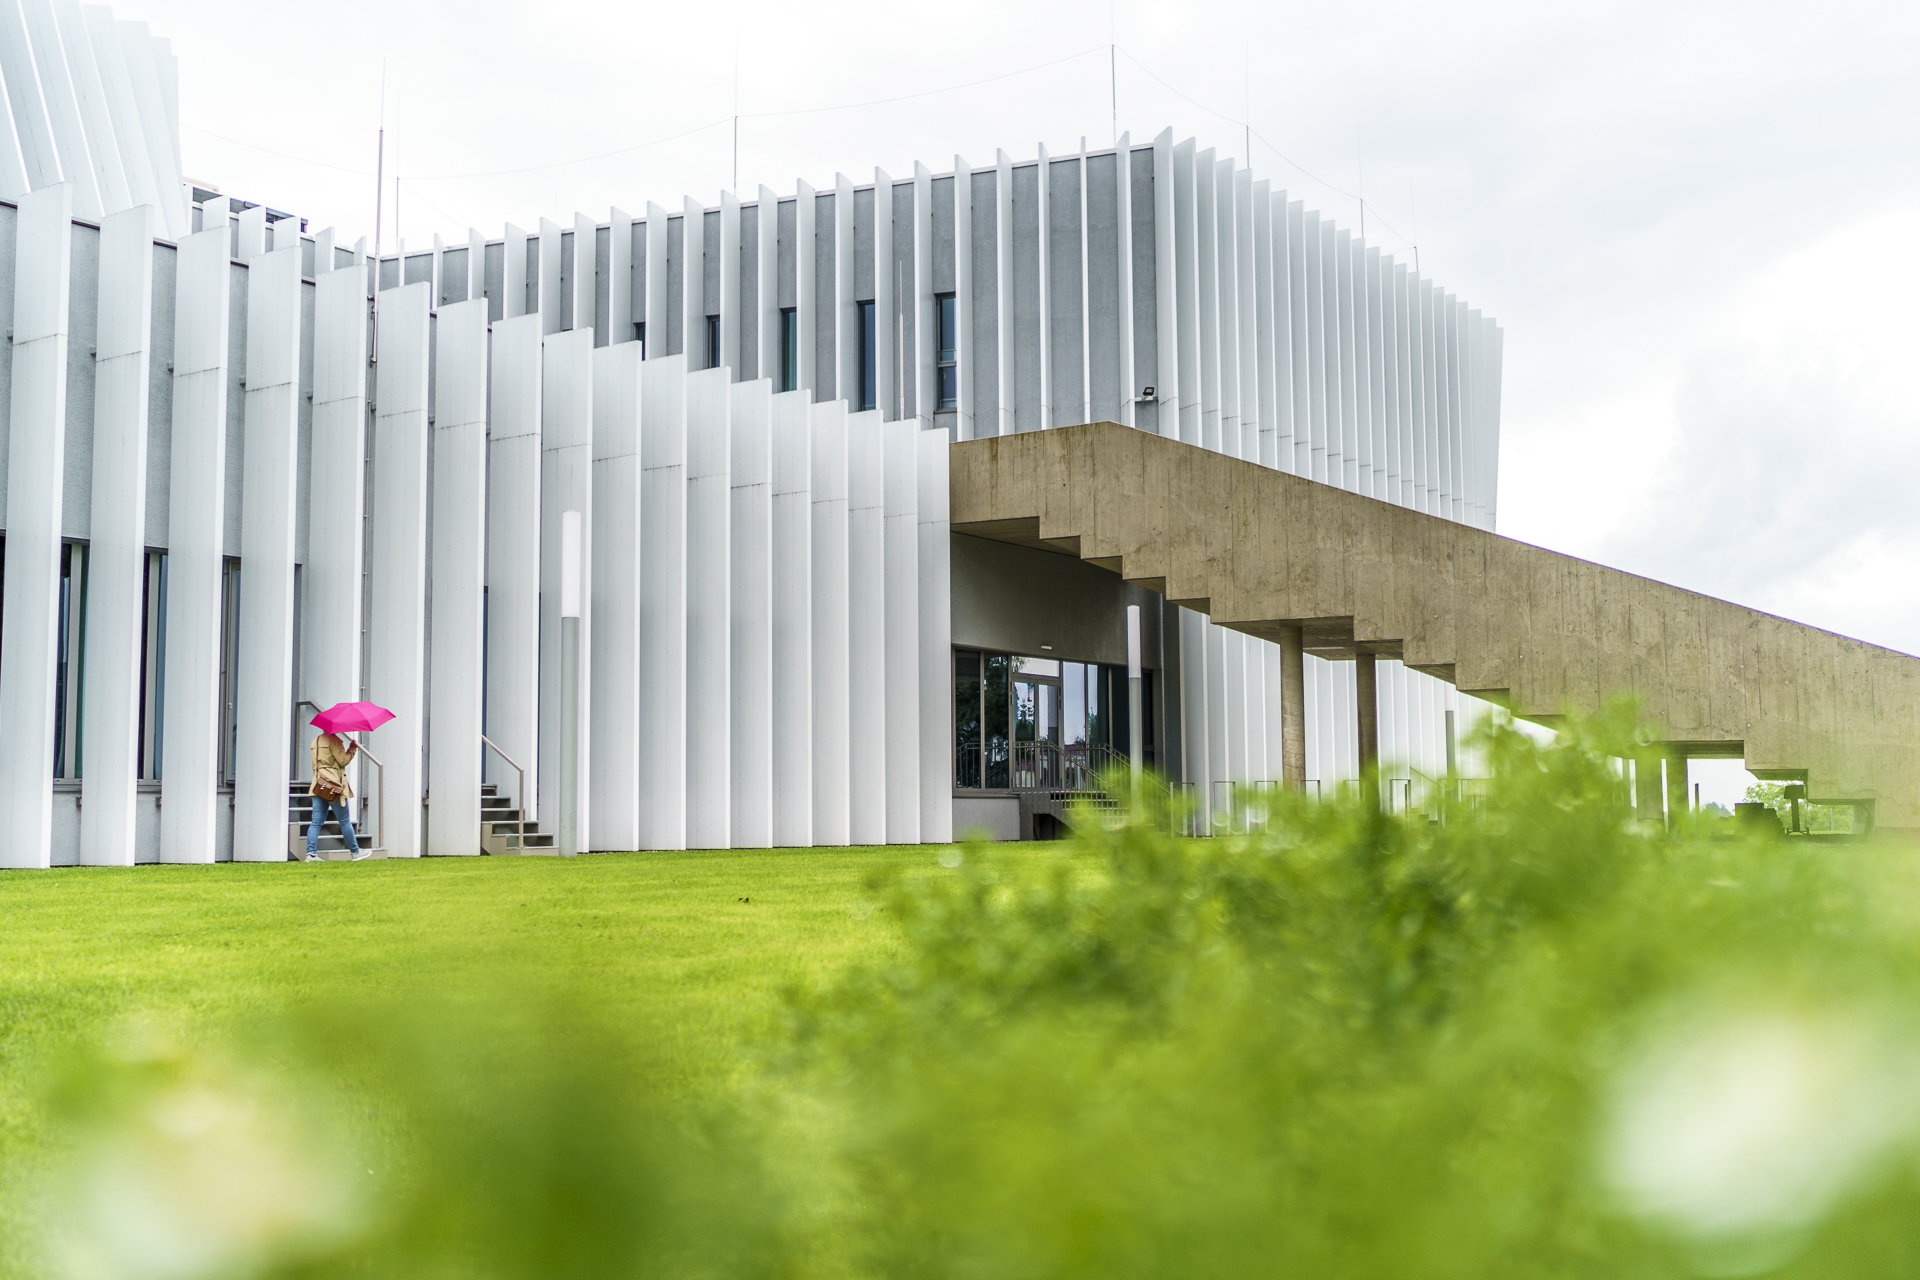 Anton Bruckner Universität